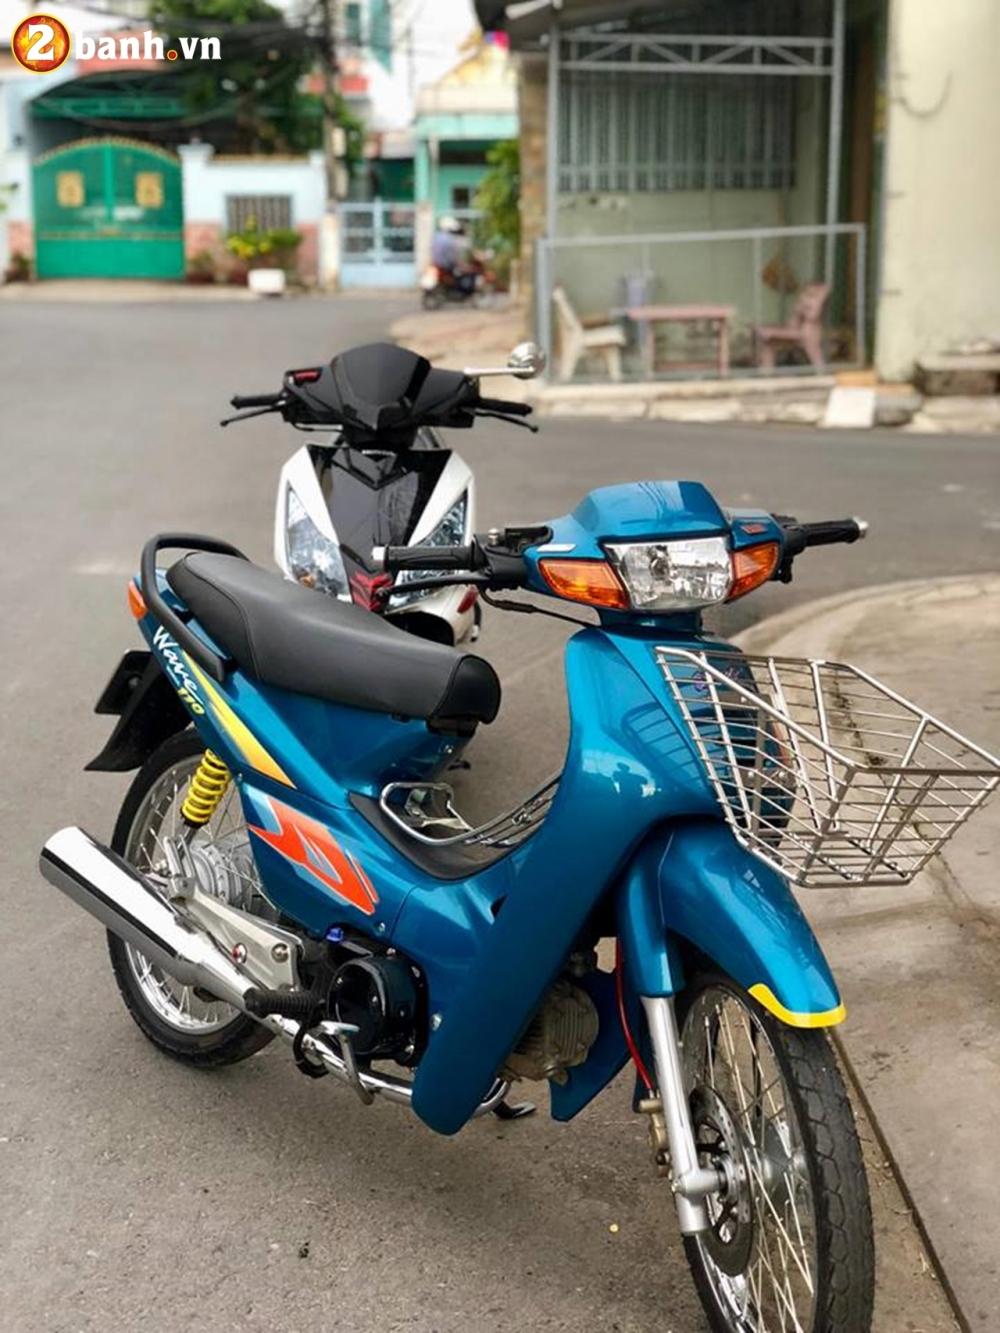 Honda Wave su hoi sinh bat diet trong moi thoi dai cua lang xe Viet - 10